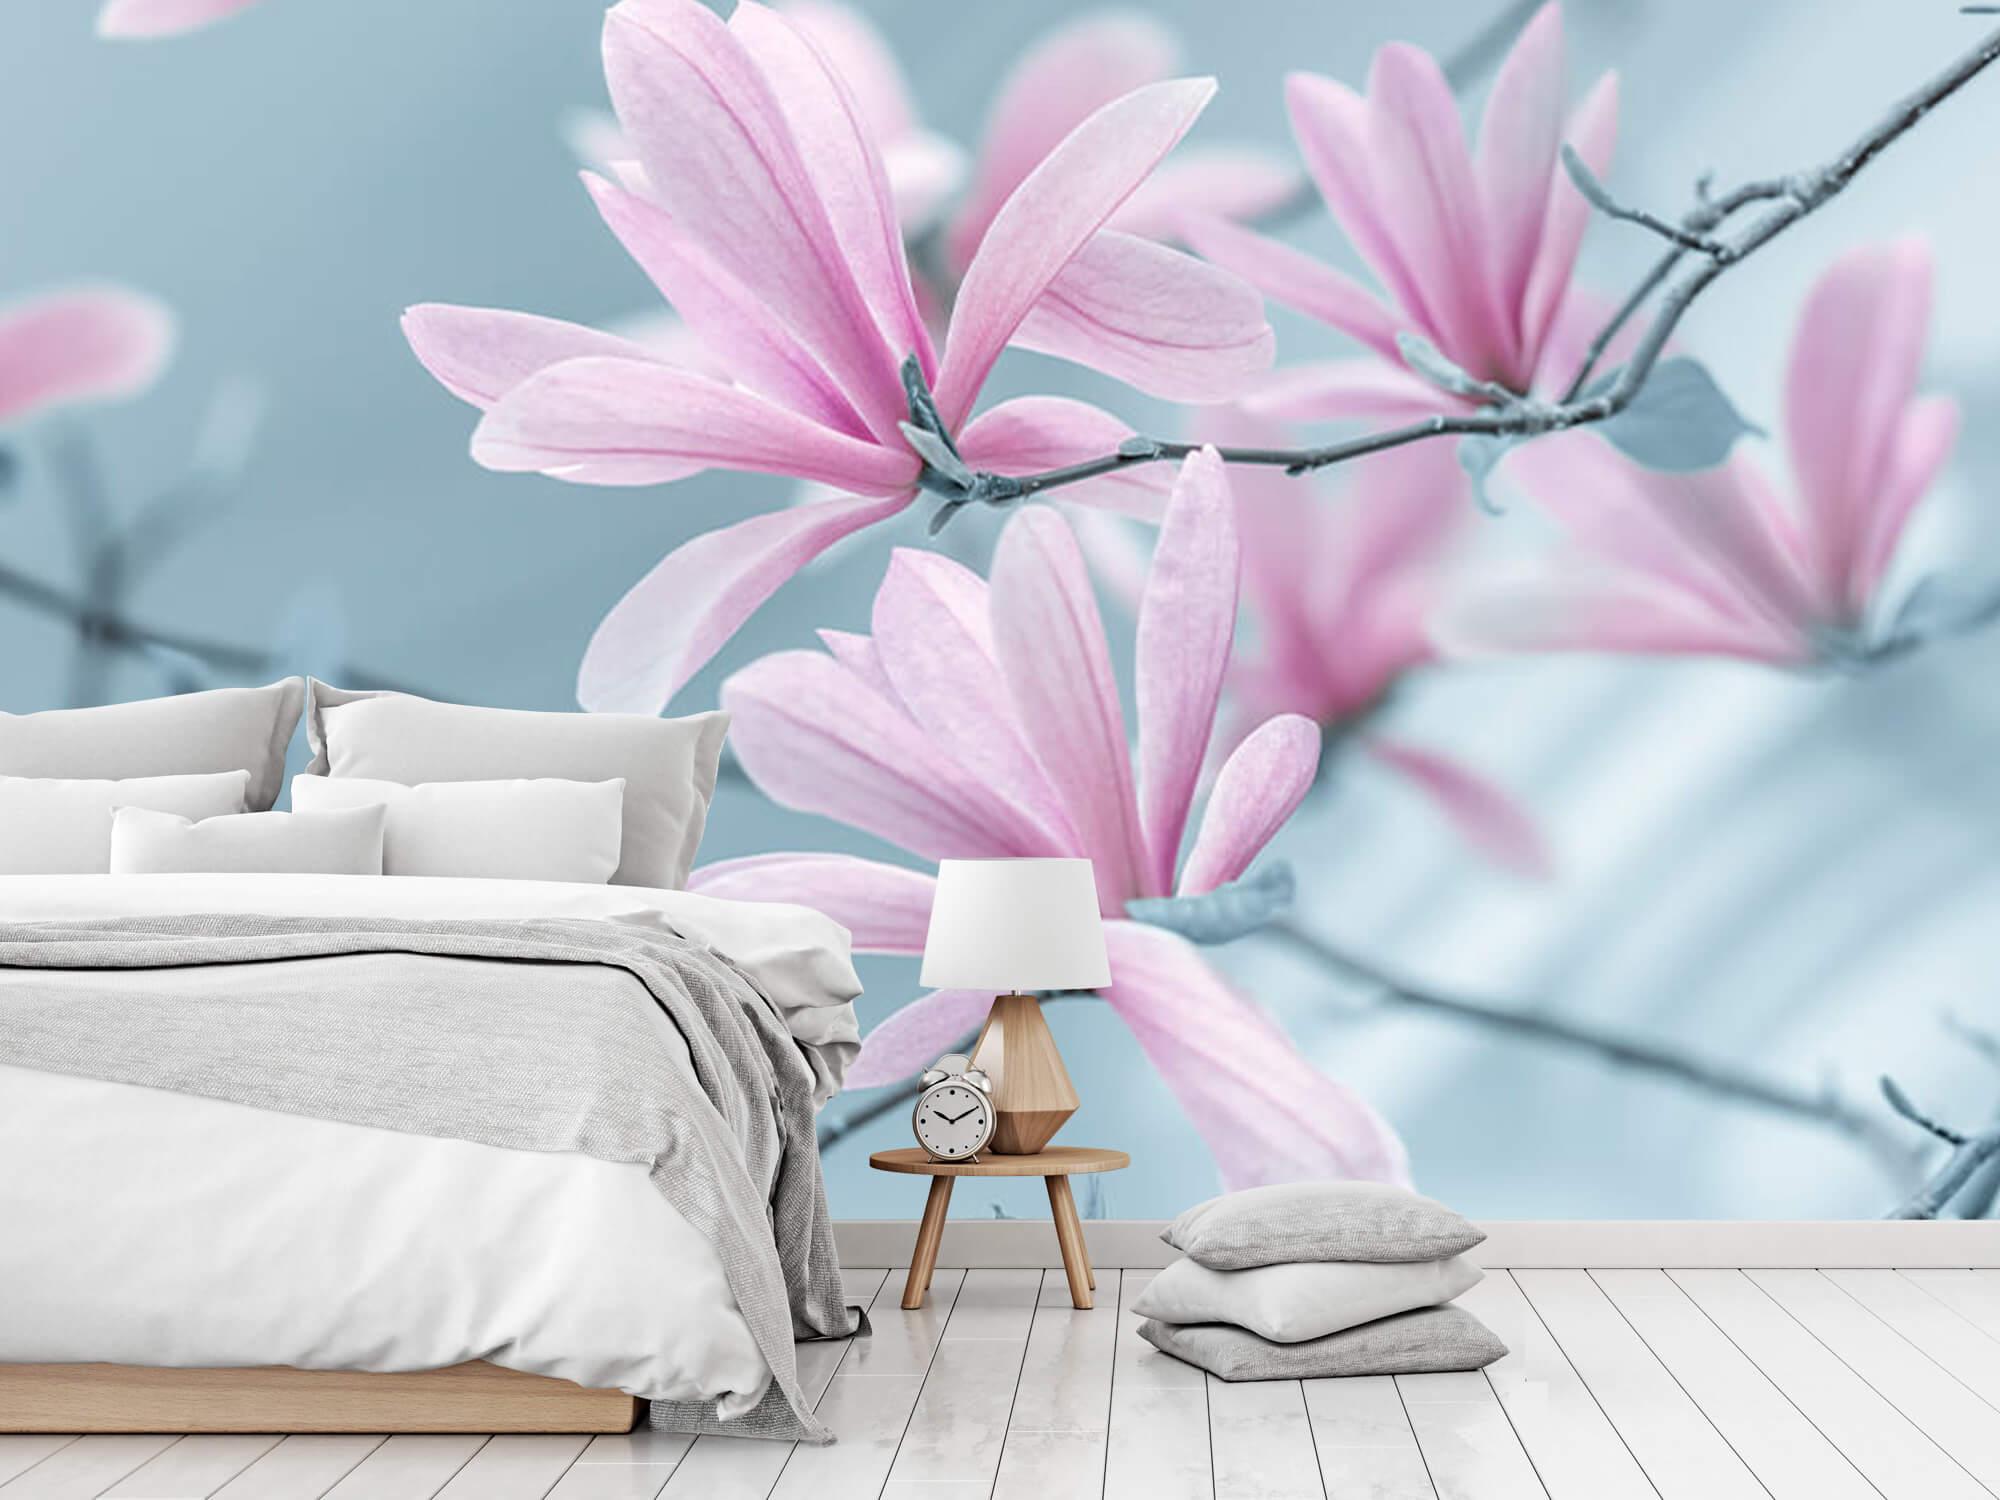 Magnolia bloemen 10